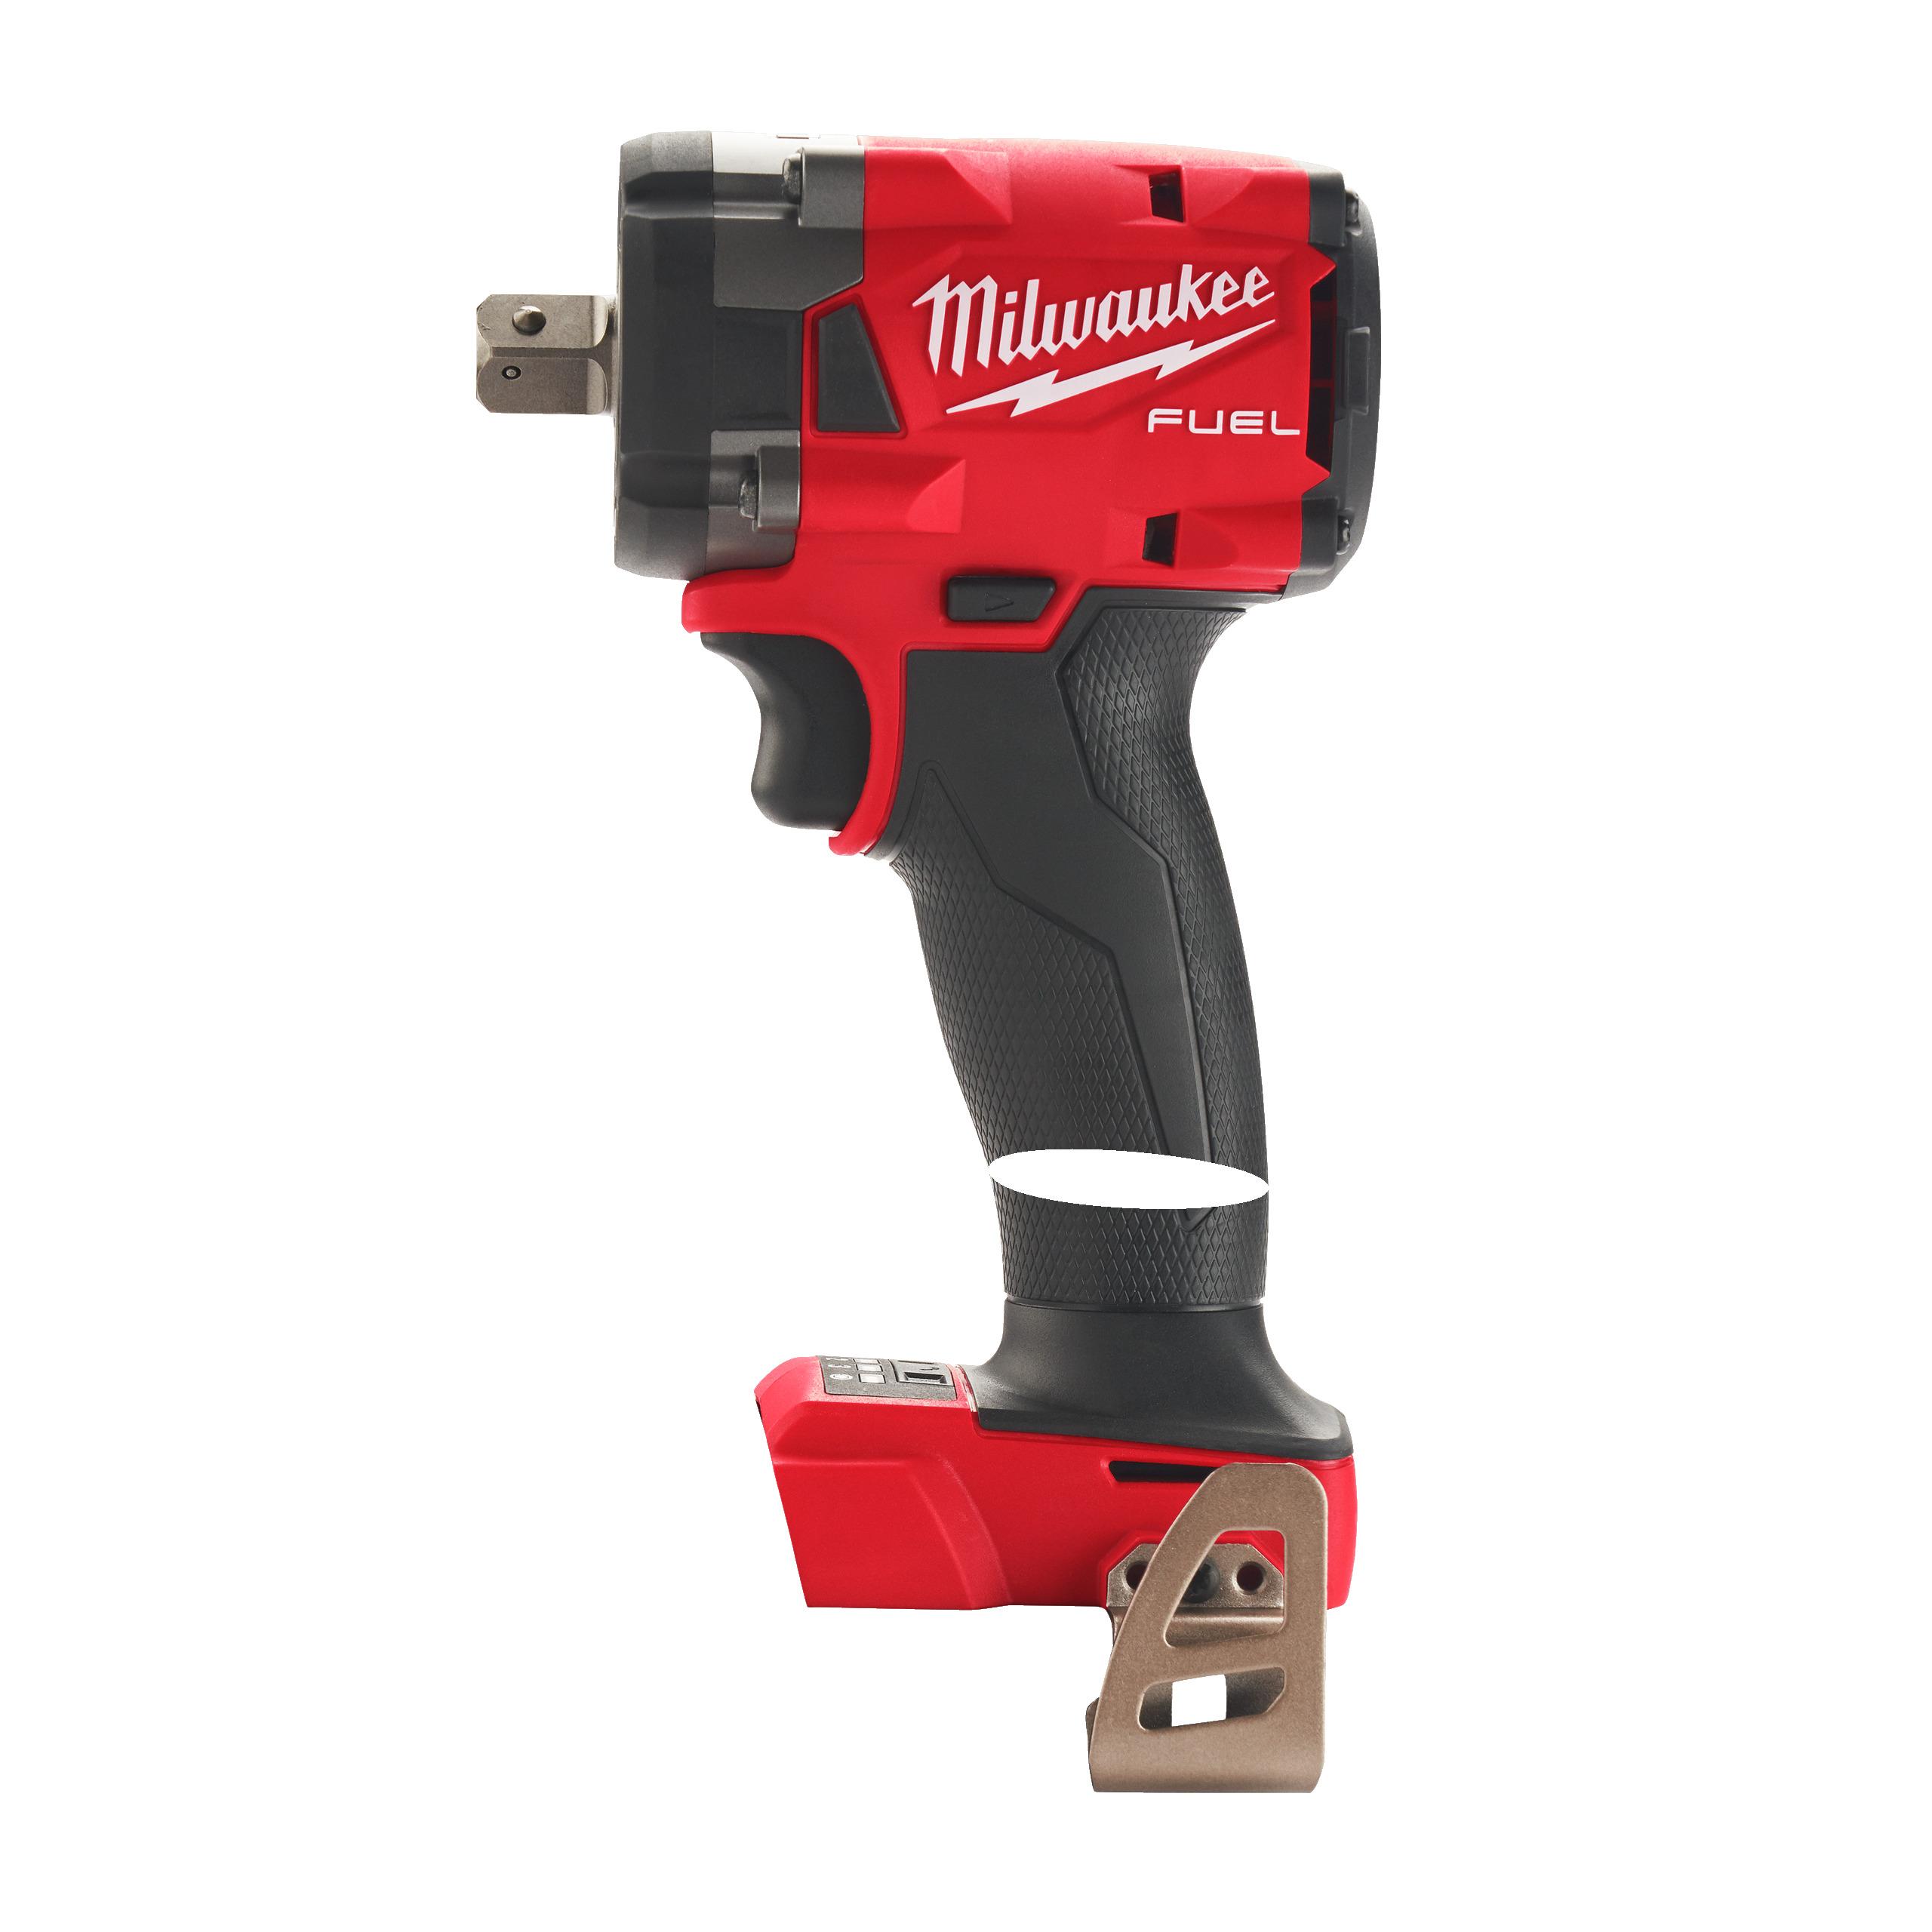 MILWAUKEE M18 FIW2P12-0X